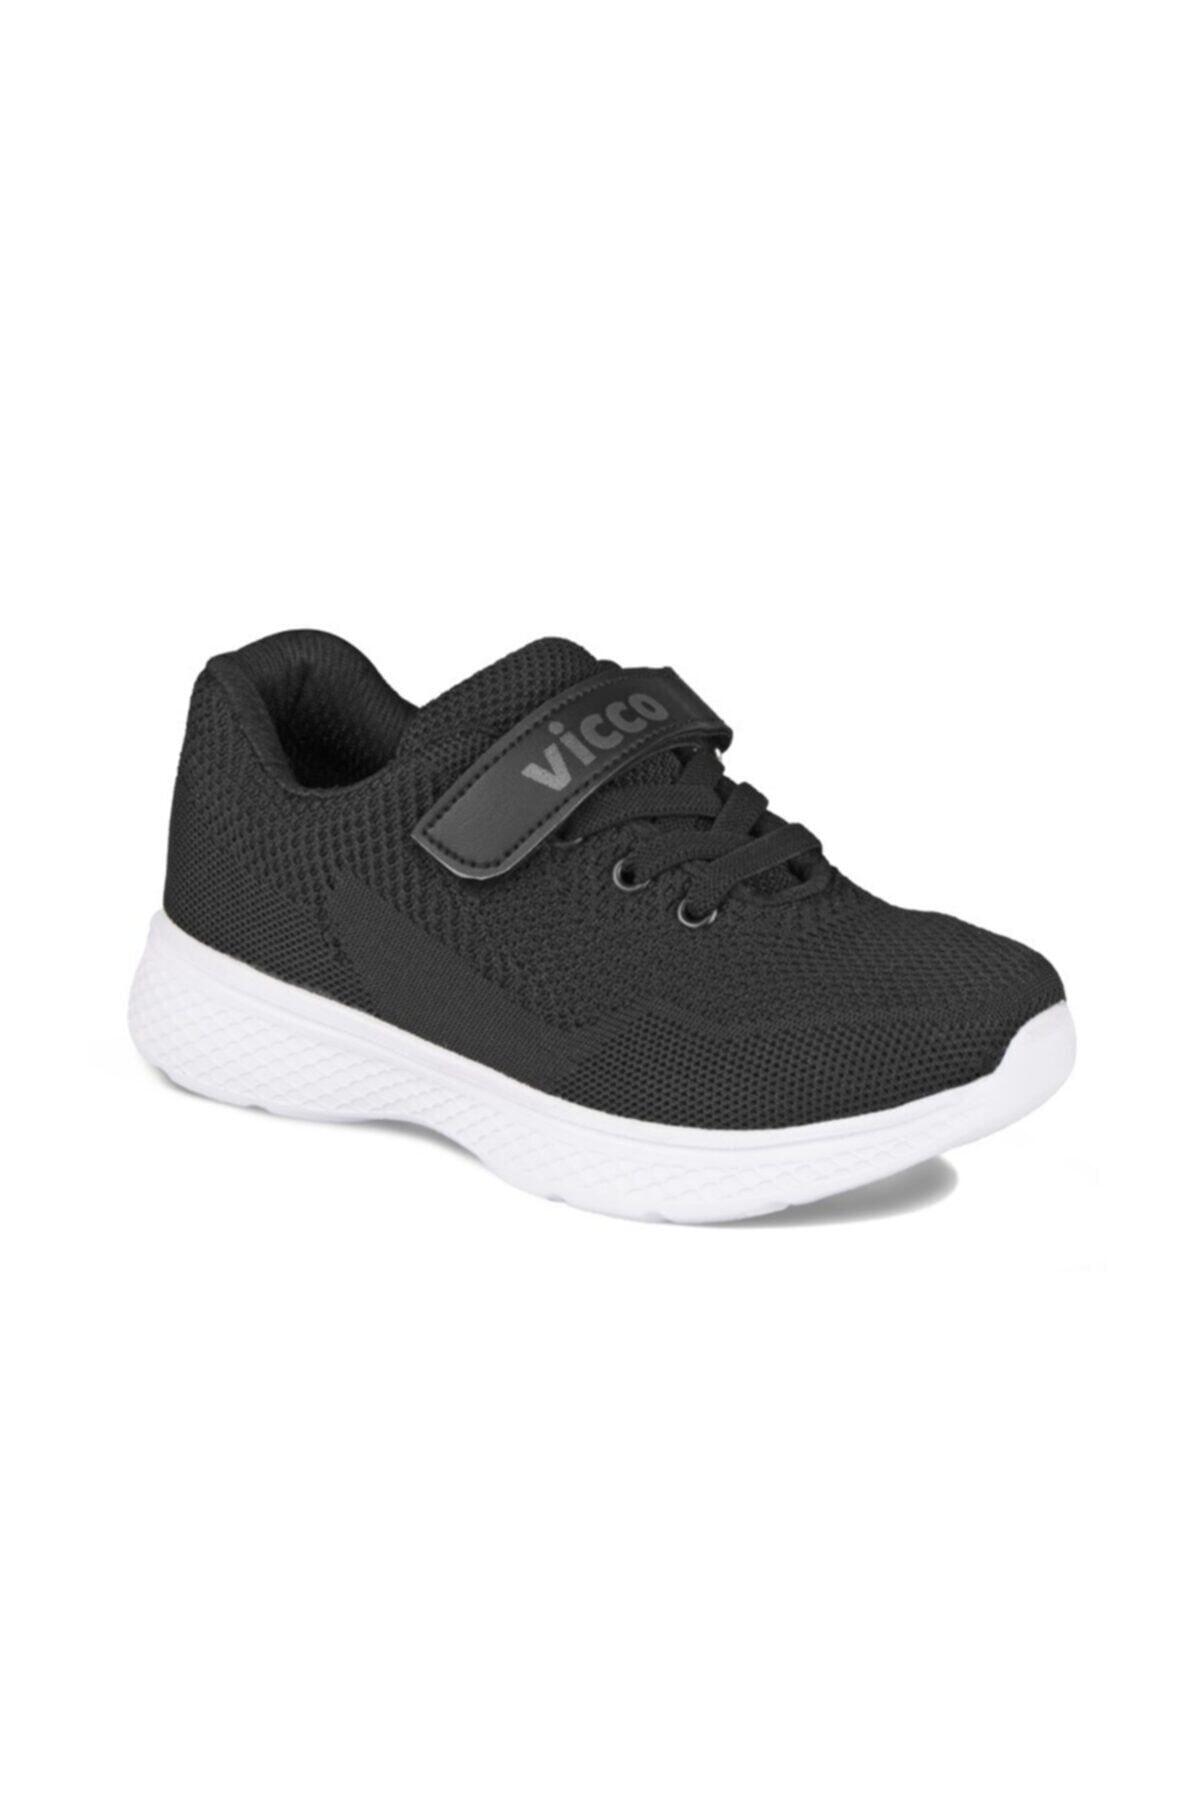 Vicco Hutson Spor Ayakkabı Siyah 1